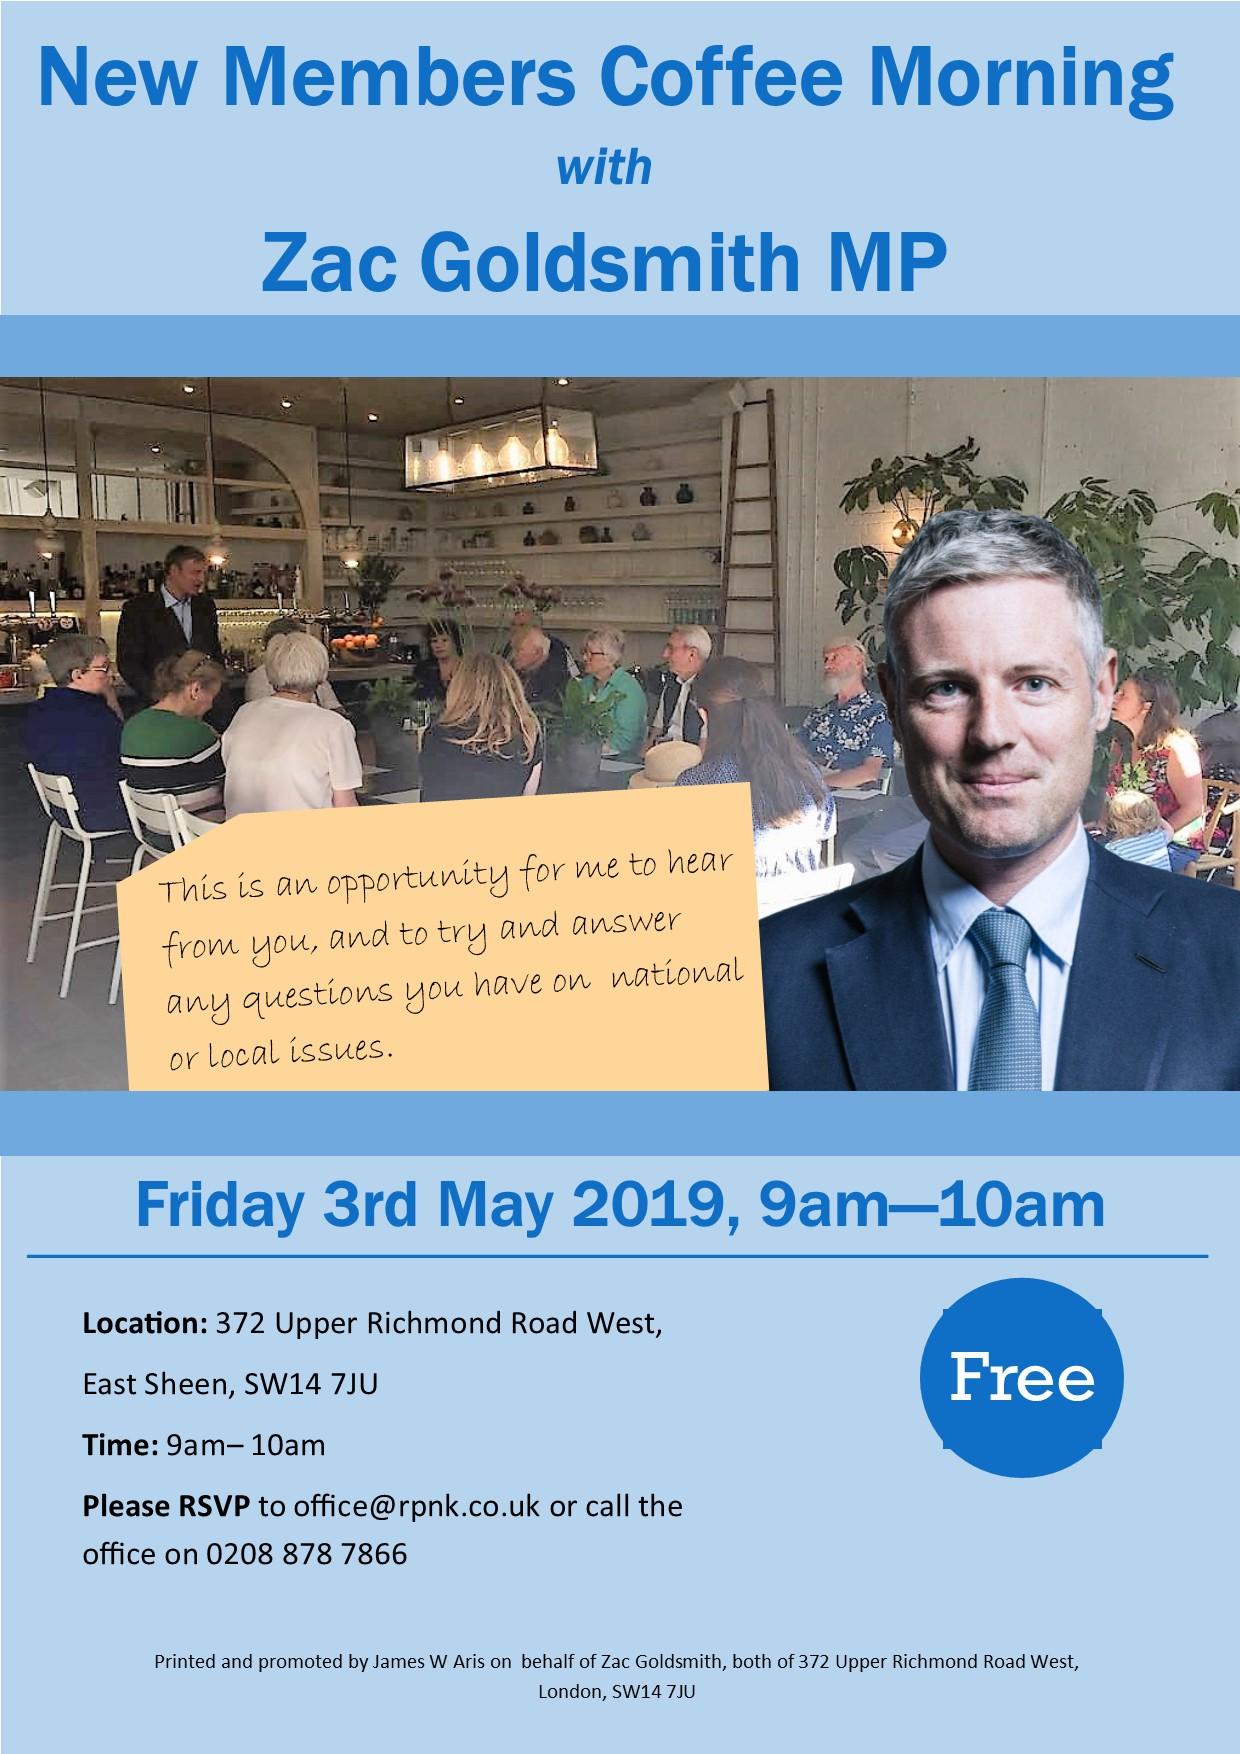 New Members Coffee Morning with Zac Goldsmith MP | Richmond